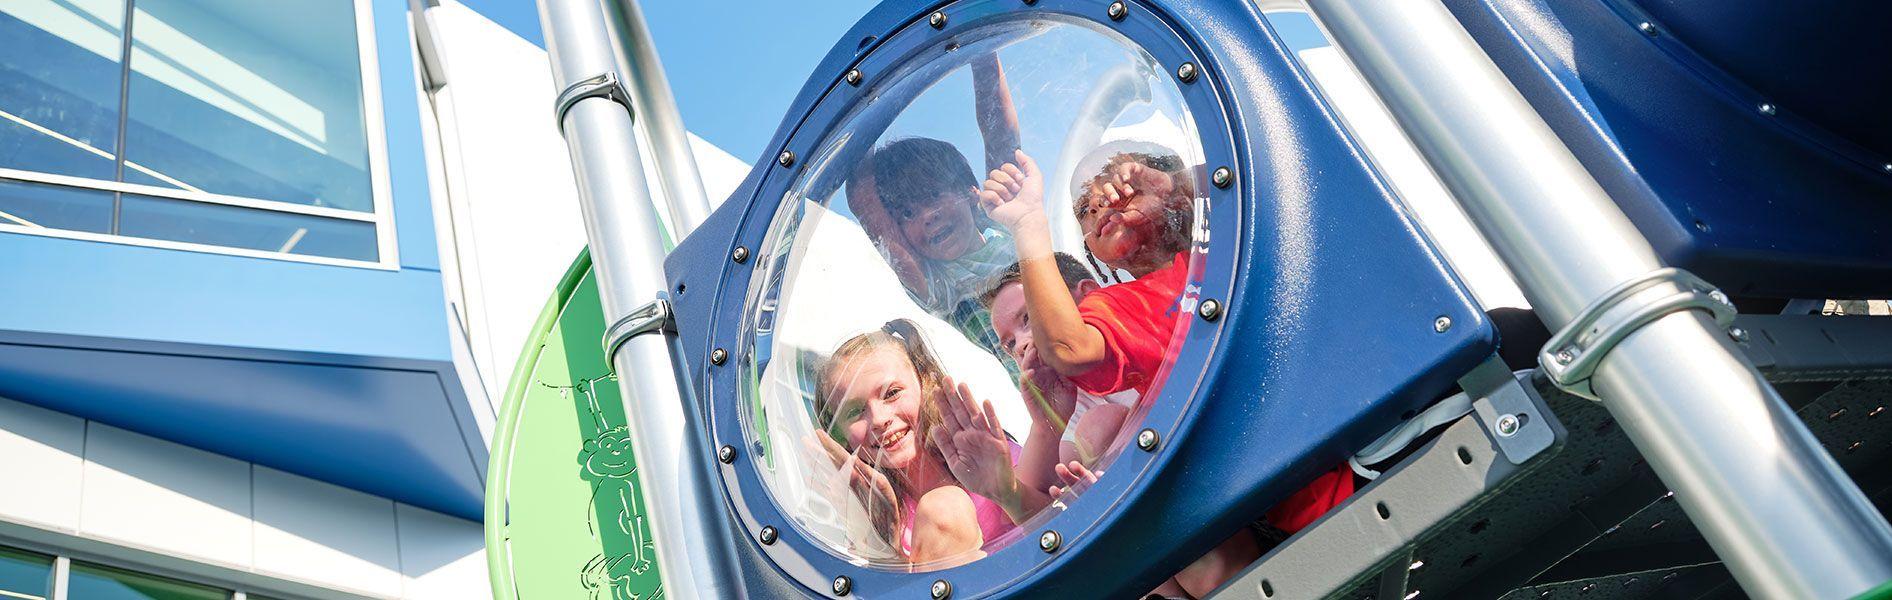 Playground bubble